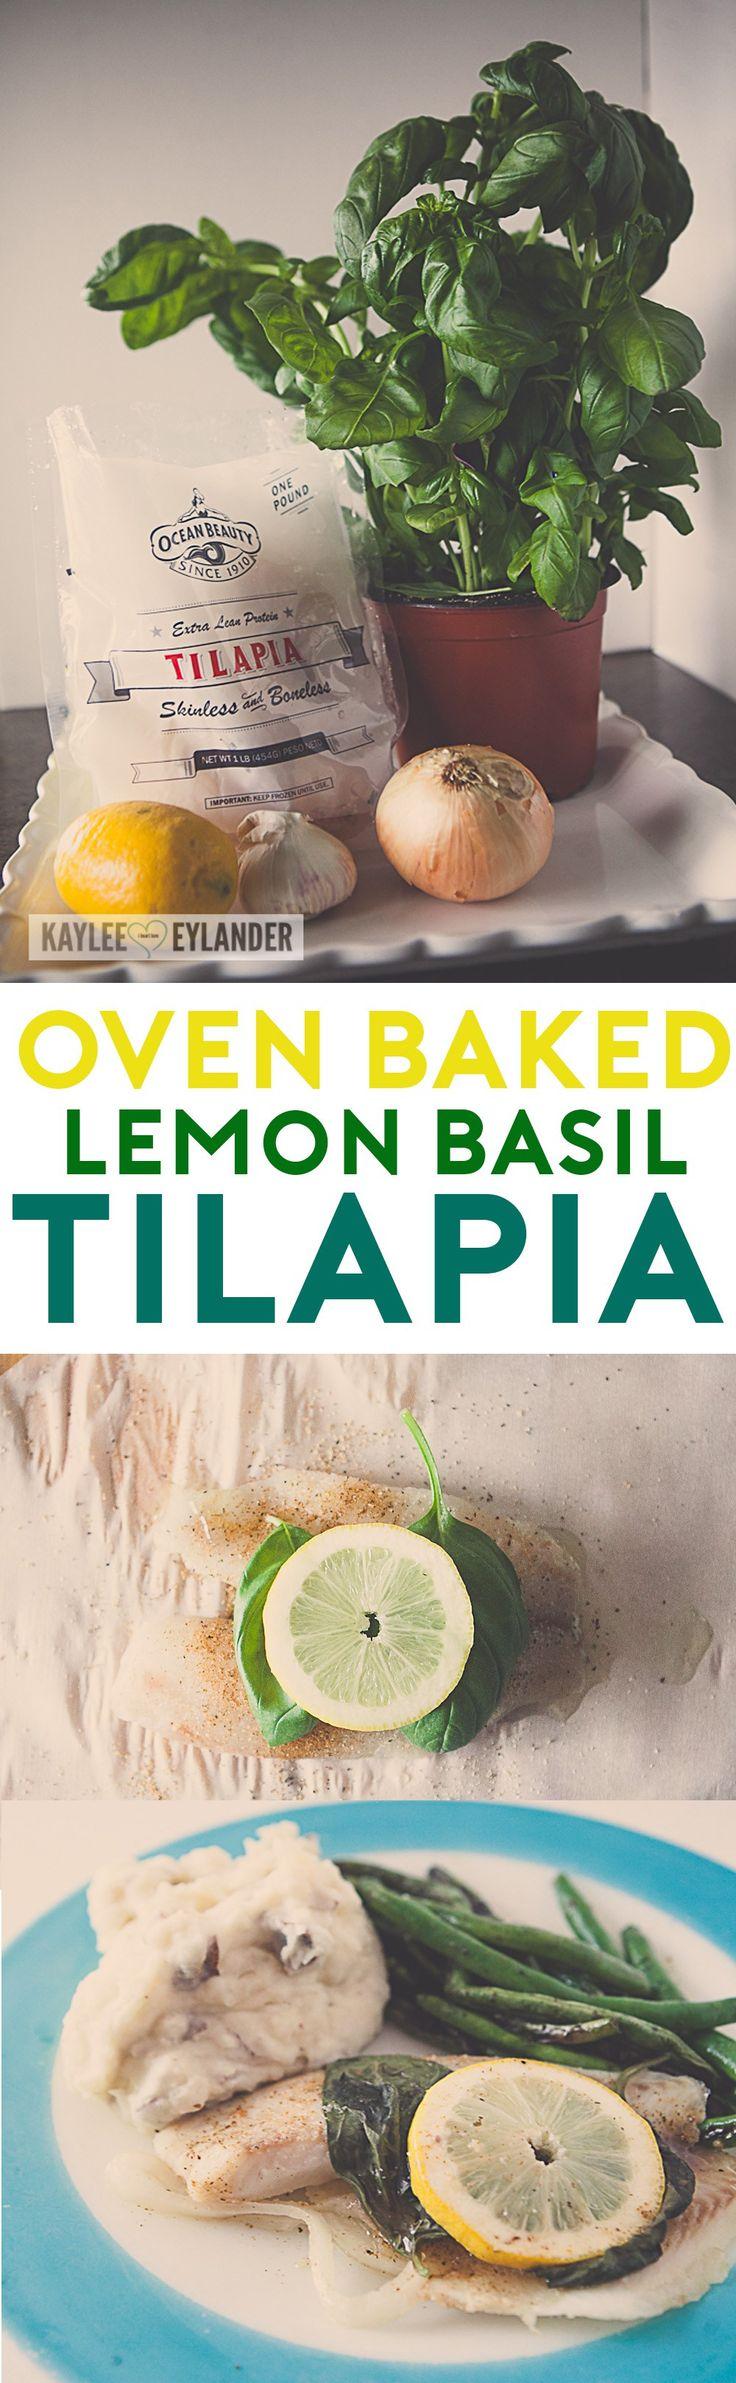 Oven Baked Tilapia Fish with Lemon Garlic and Basil